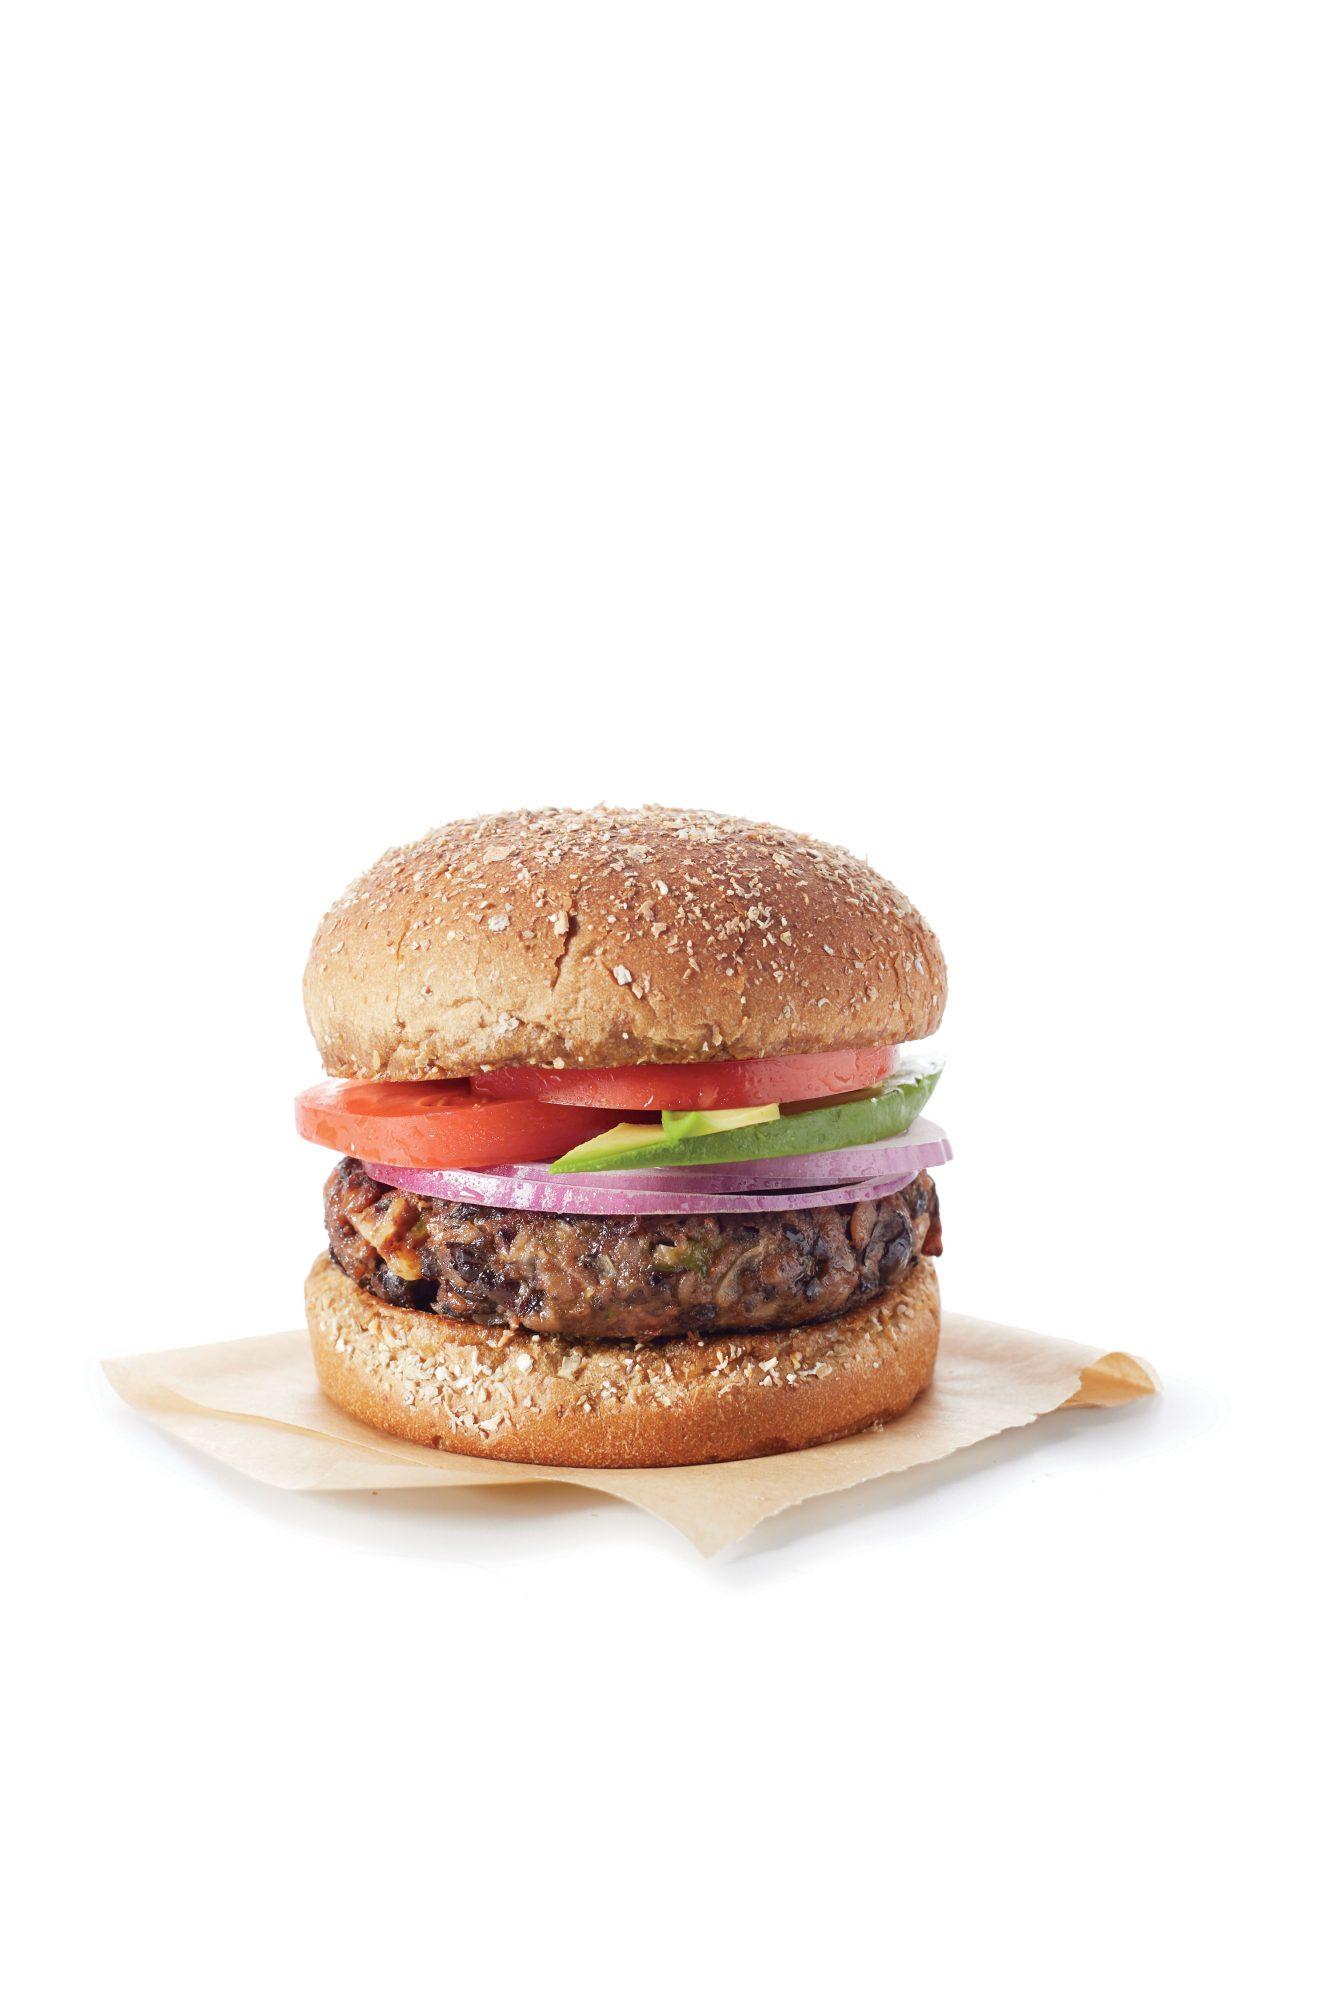 20-Minute Black Bean Burgers